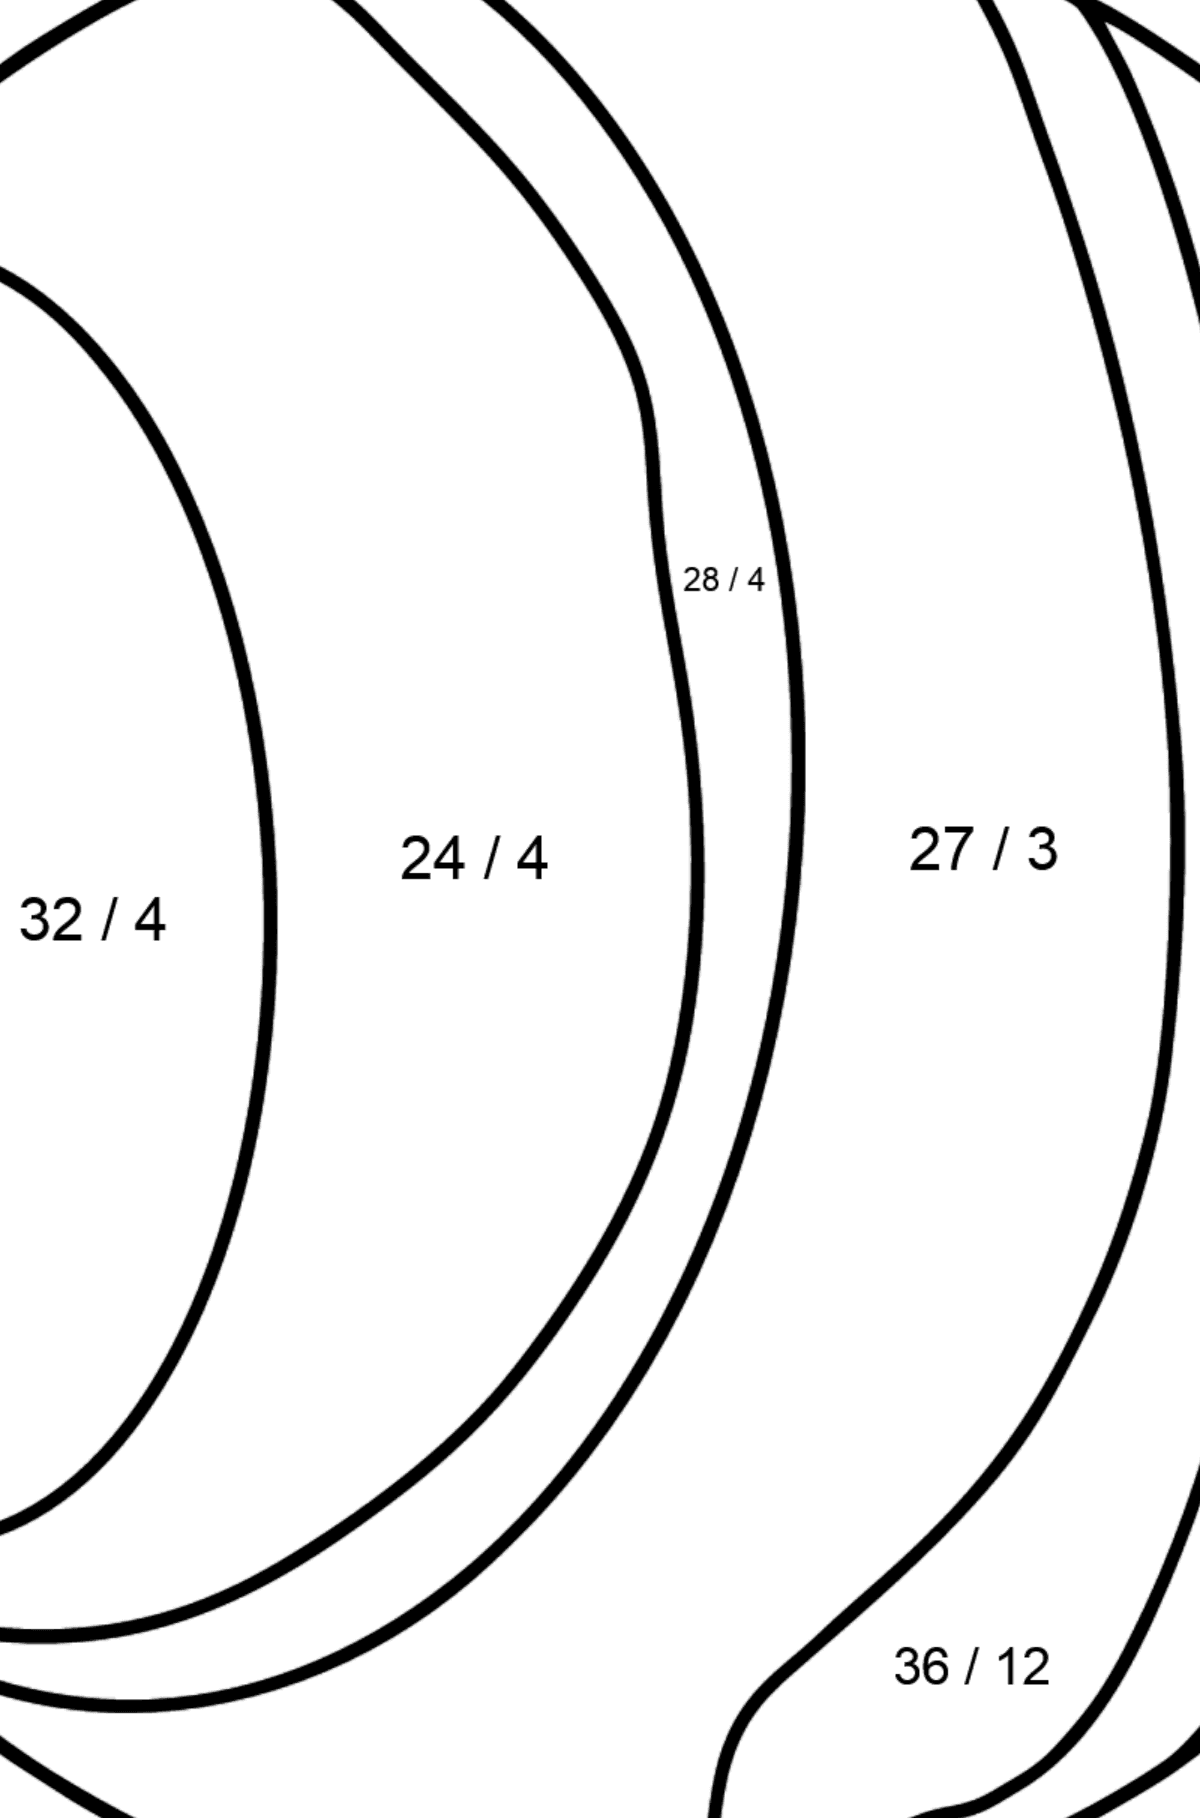 Uranus coloring page - Math Coloring - Division for Kids